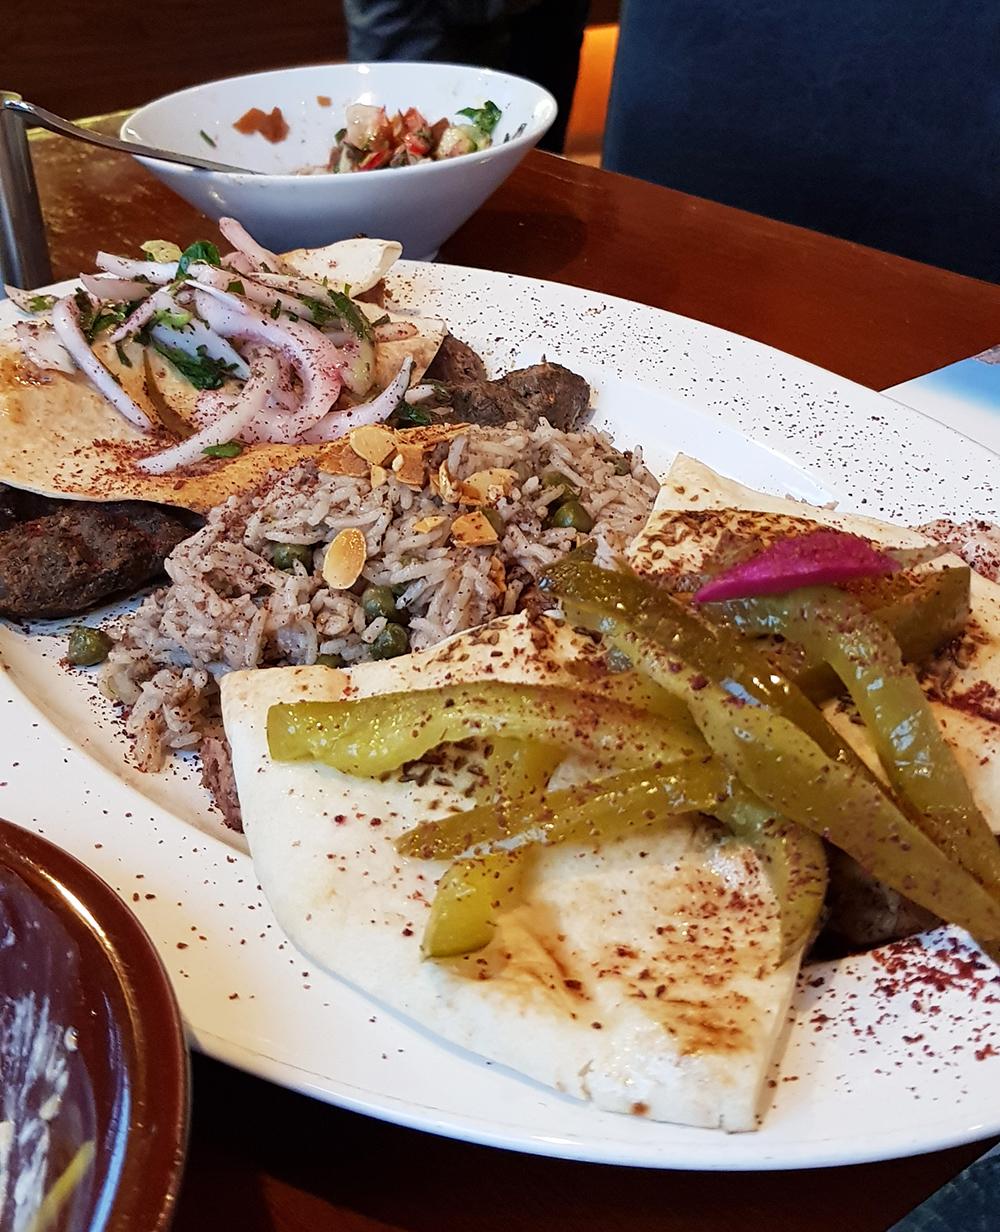 beirut-star-lebanese-food3